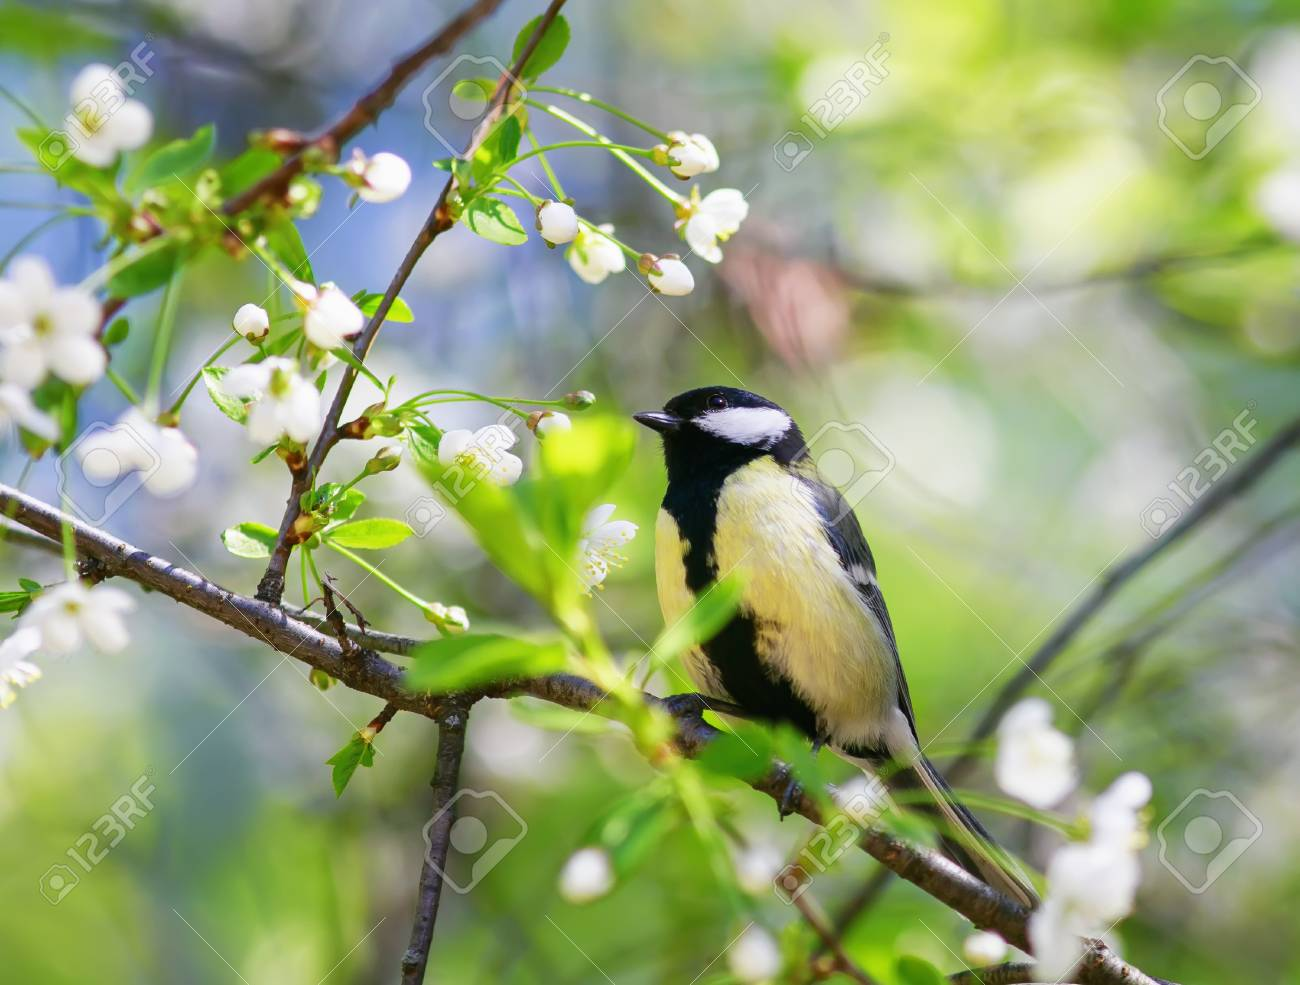 Cute Bird Sitting In The Garden On A Cherry Branch In White Spring